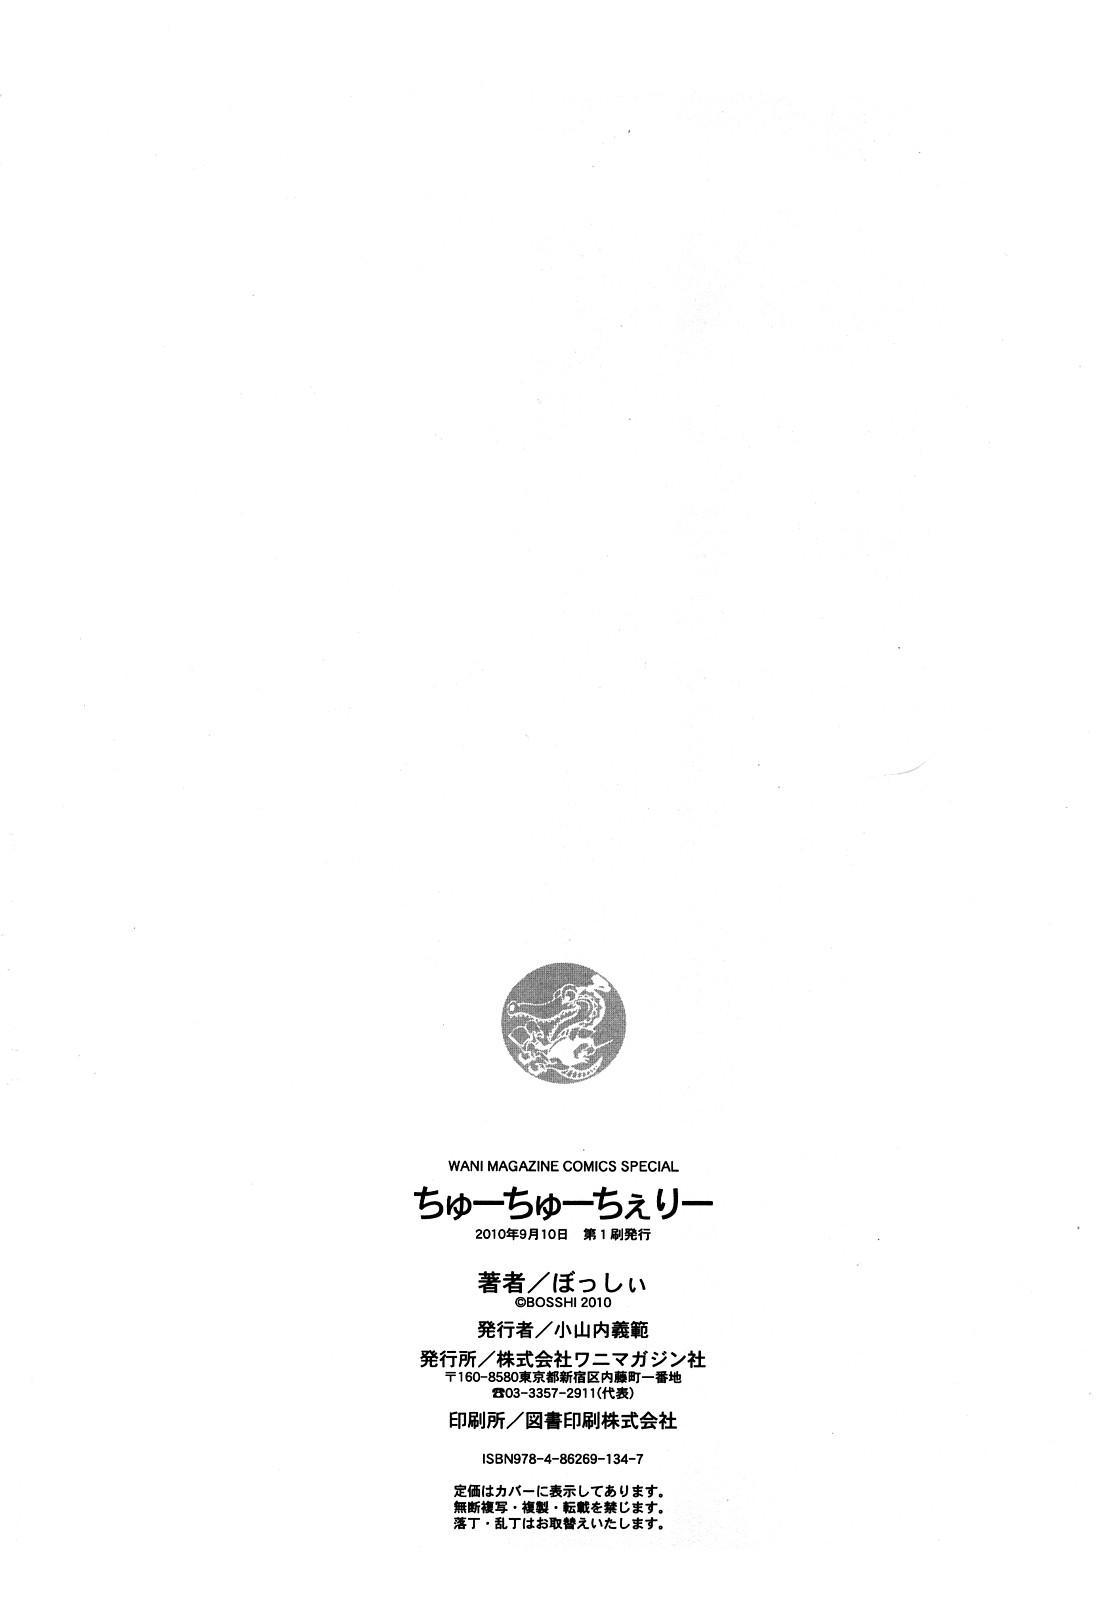 [Bosshi] Chu~Chu~Cherry~ [English] {Yoroshii + Ryuutama + LWB + Afro + YQII + EHCove} 195